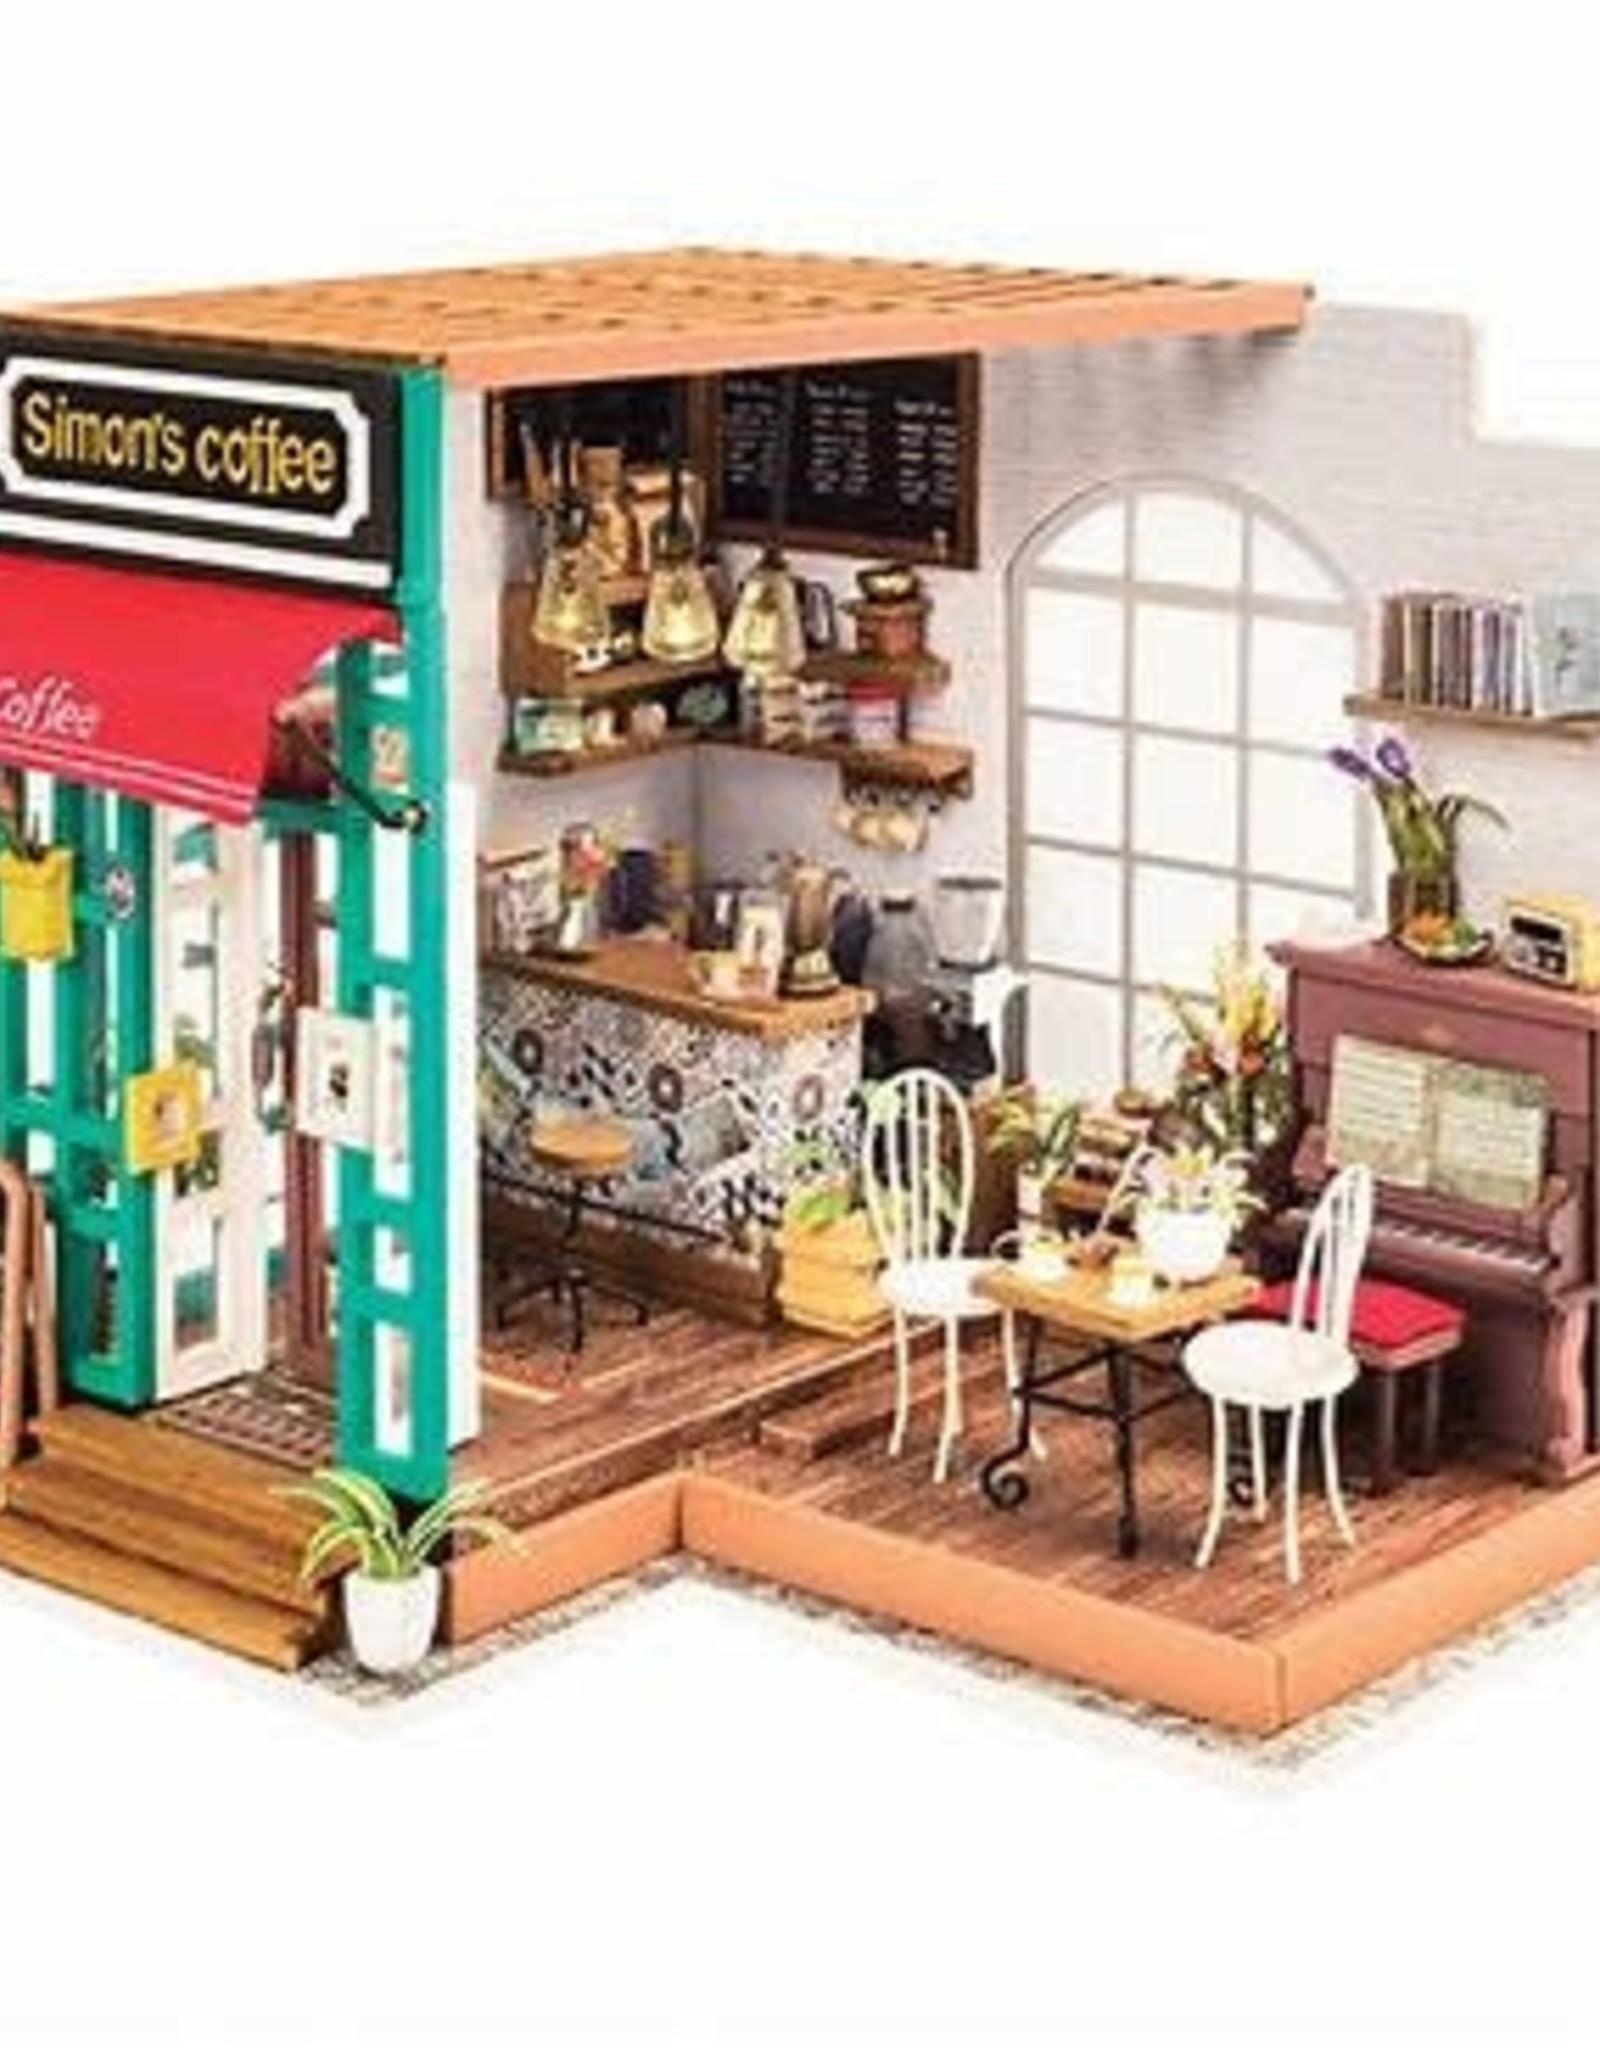 DIY Miniature House: Simon's Coffee Shop